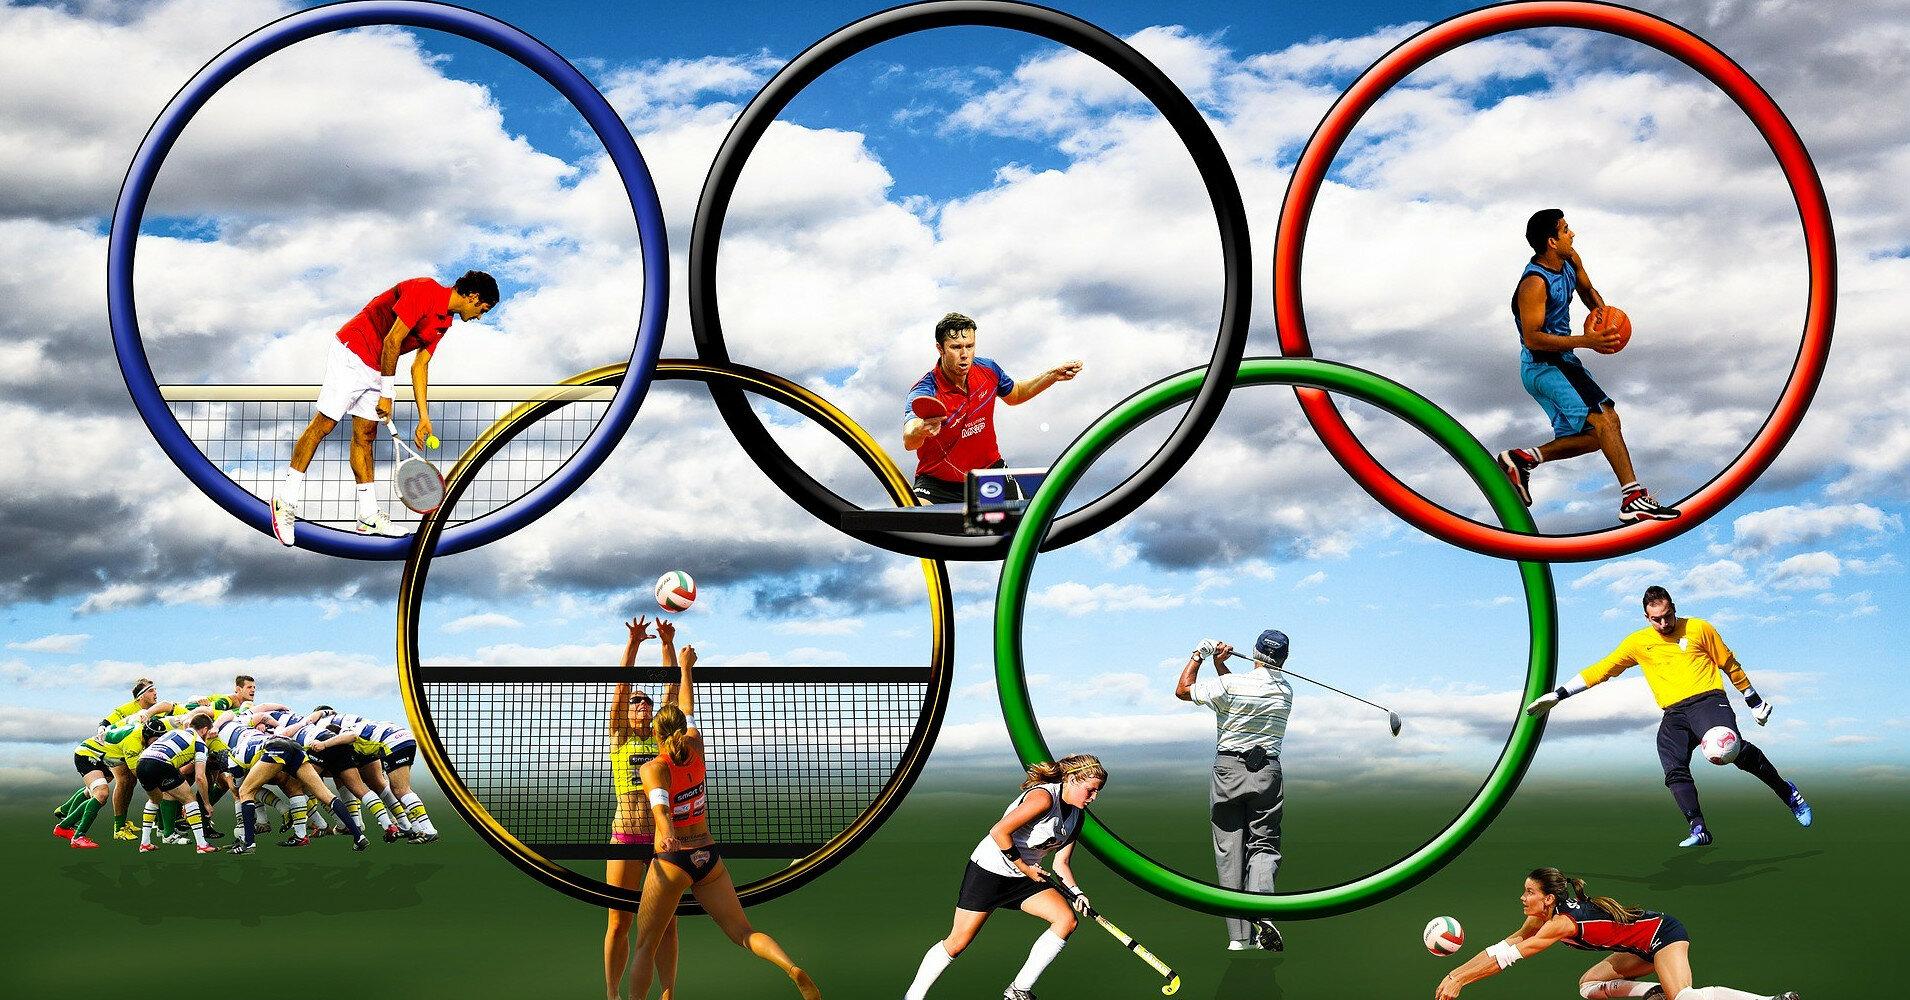 Трансгендер из США не смог пробиться на Олимпиаду-2020